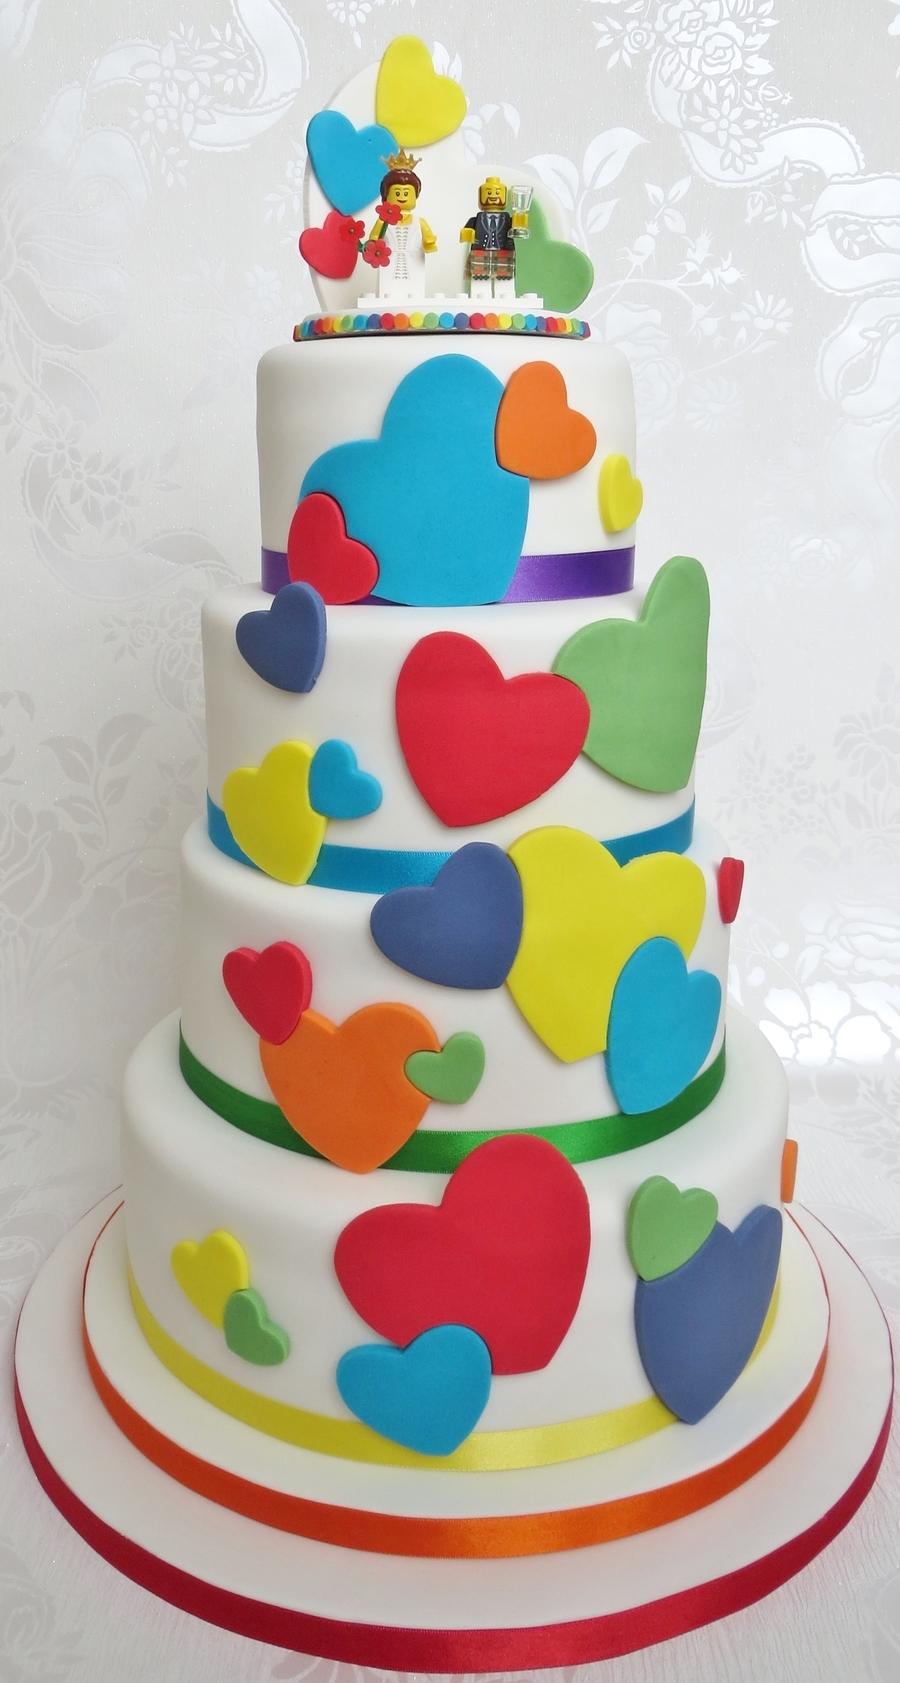 Rainbow Wedding Cake Design